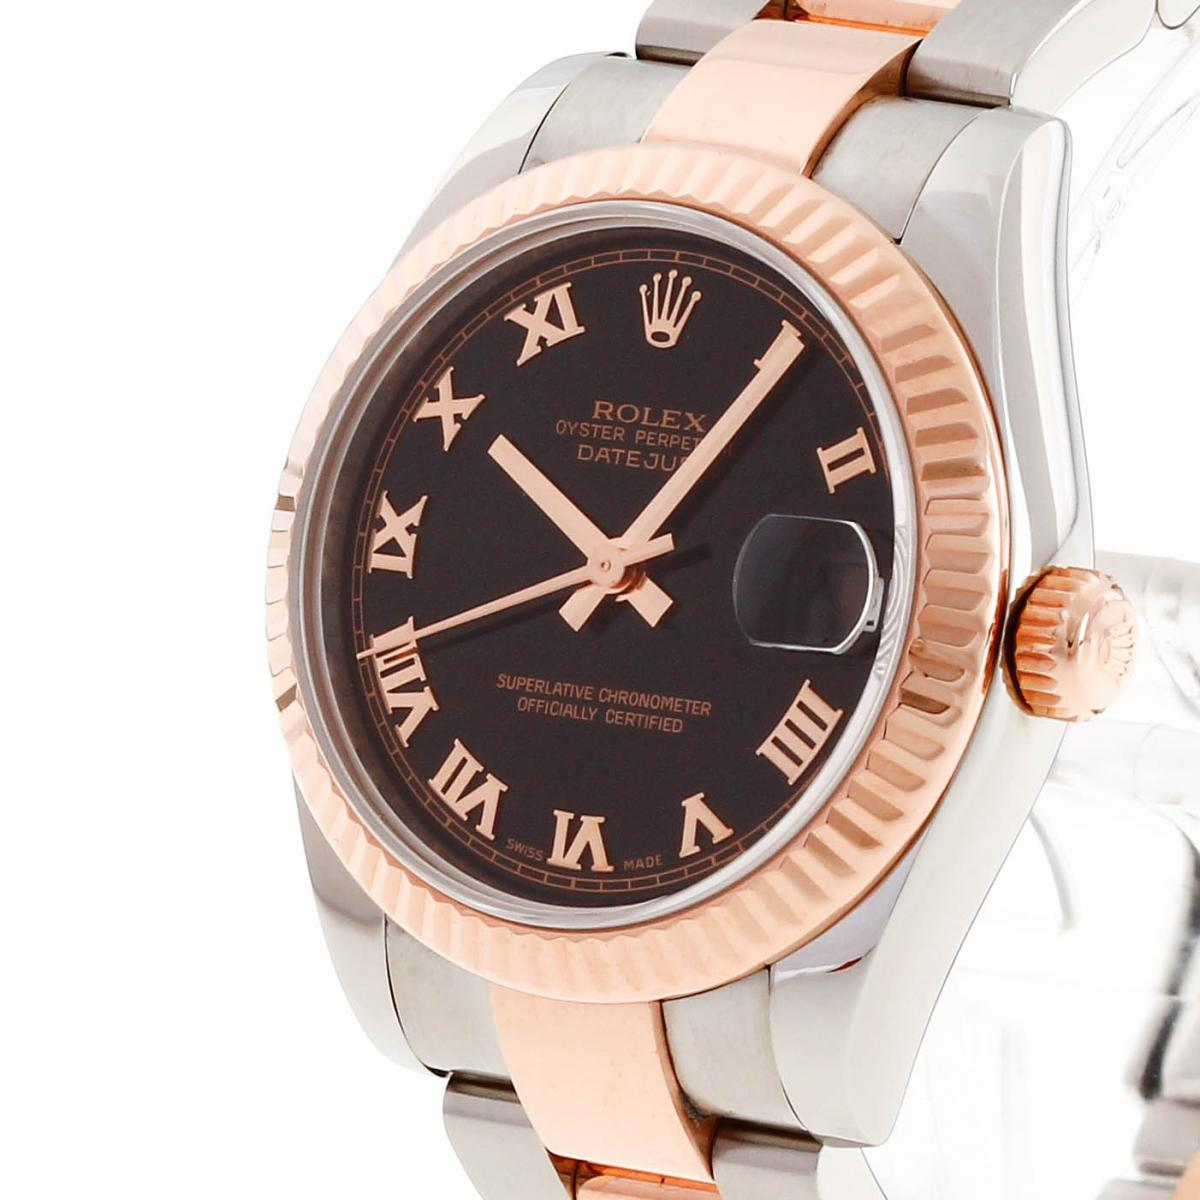 Rolex Oyster Perpetual Datejust 31 Medium Ref. 178274